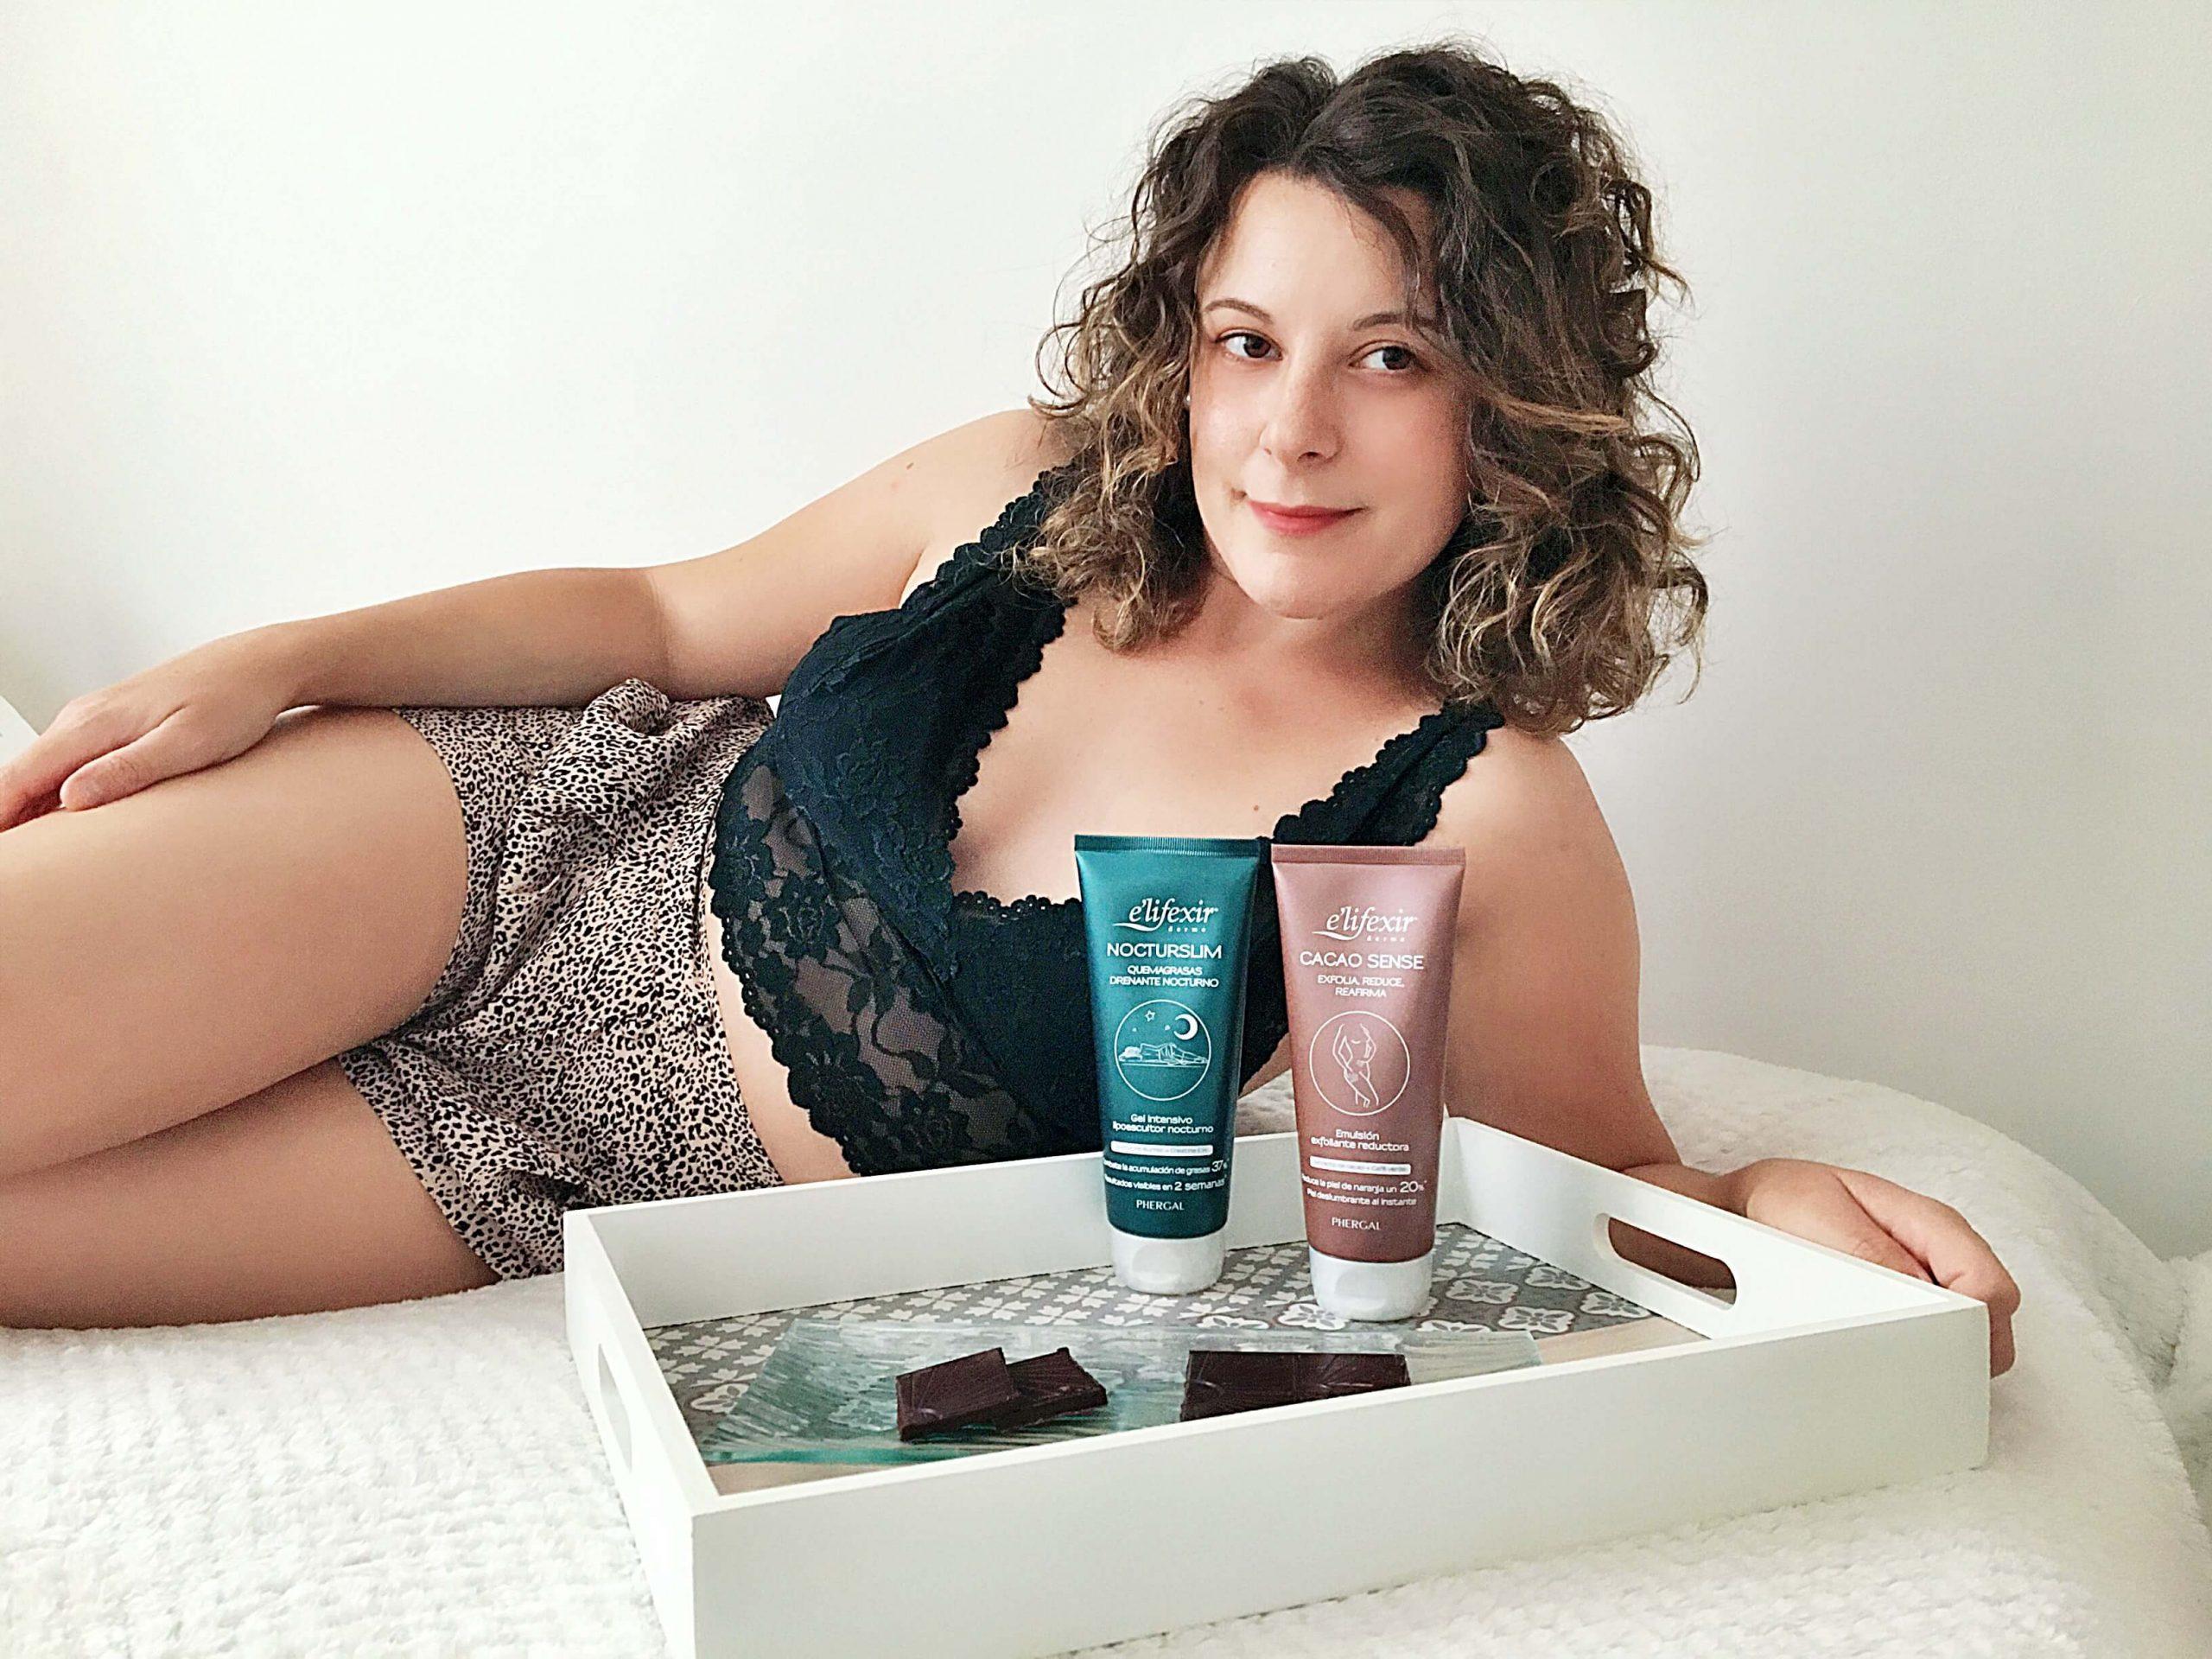 Minirvanadebellezadecadadiaconelifexir-blogger-influencer-emprendedora4